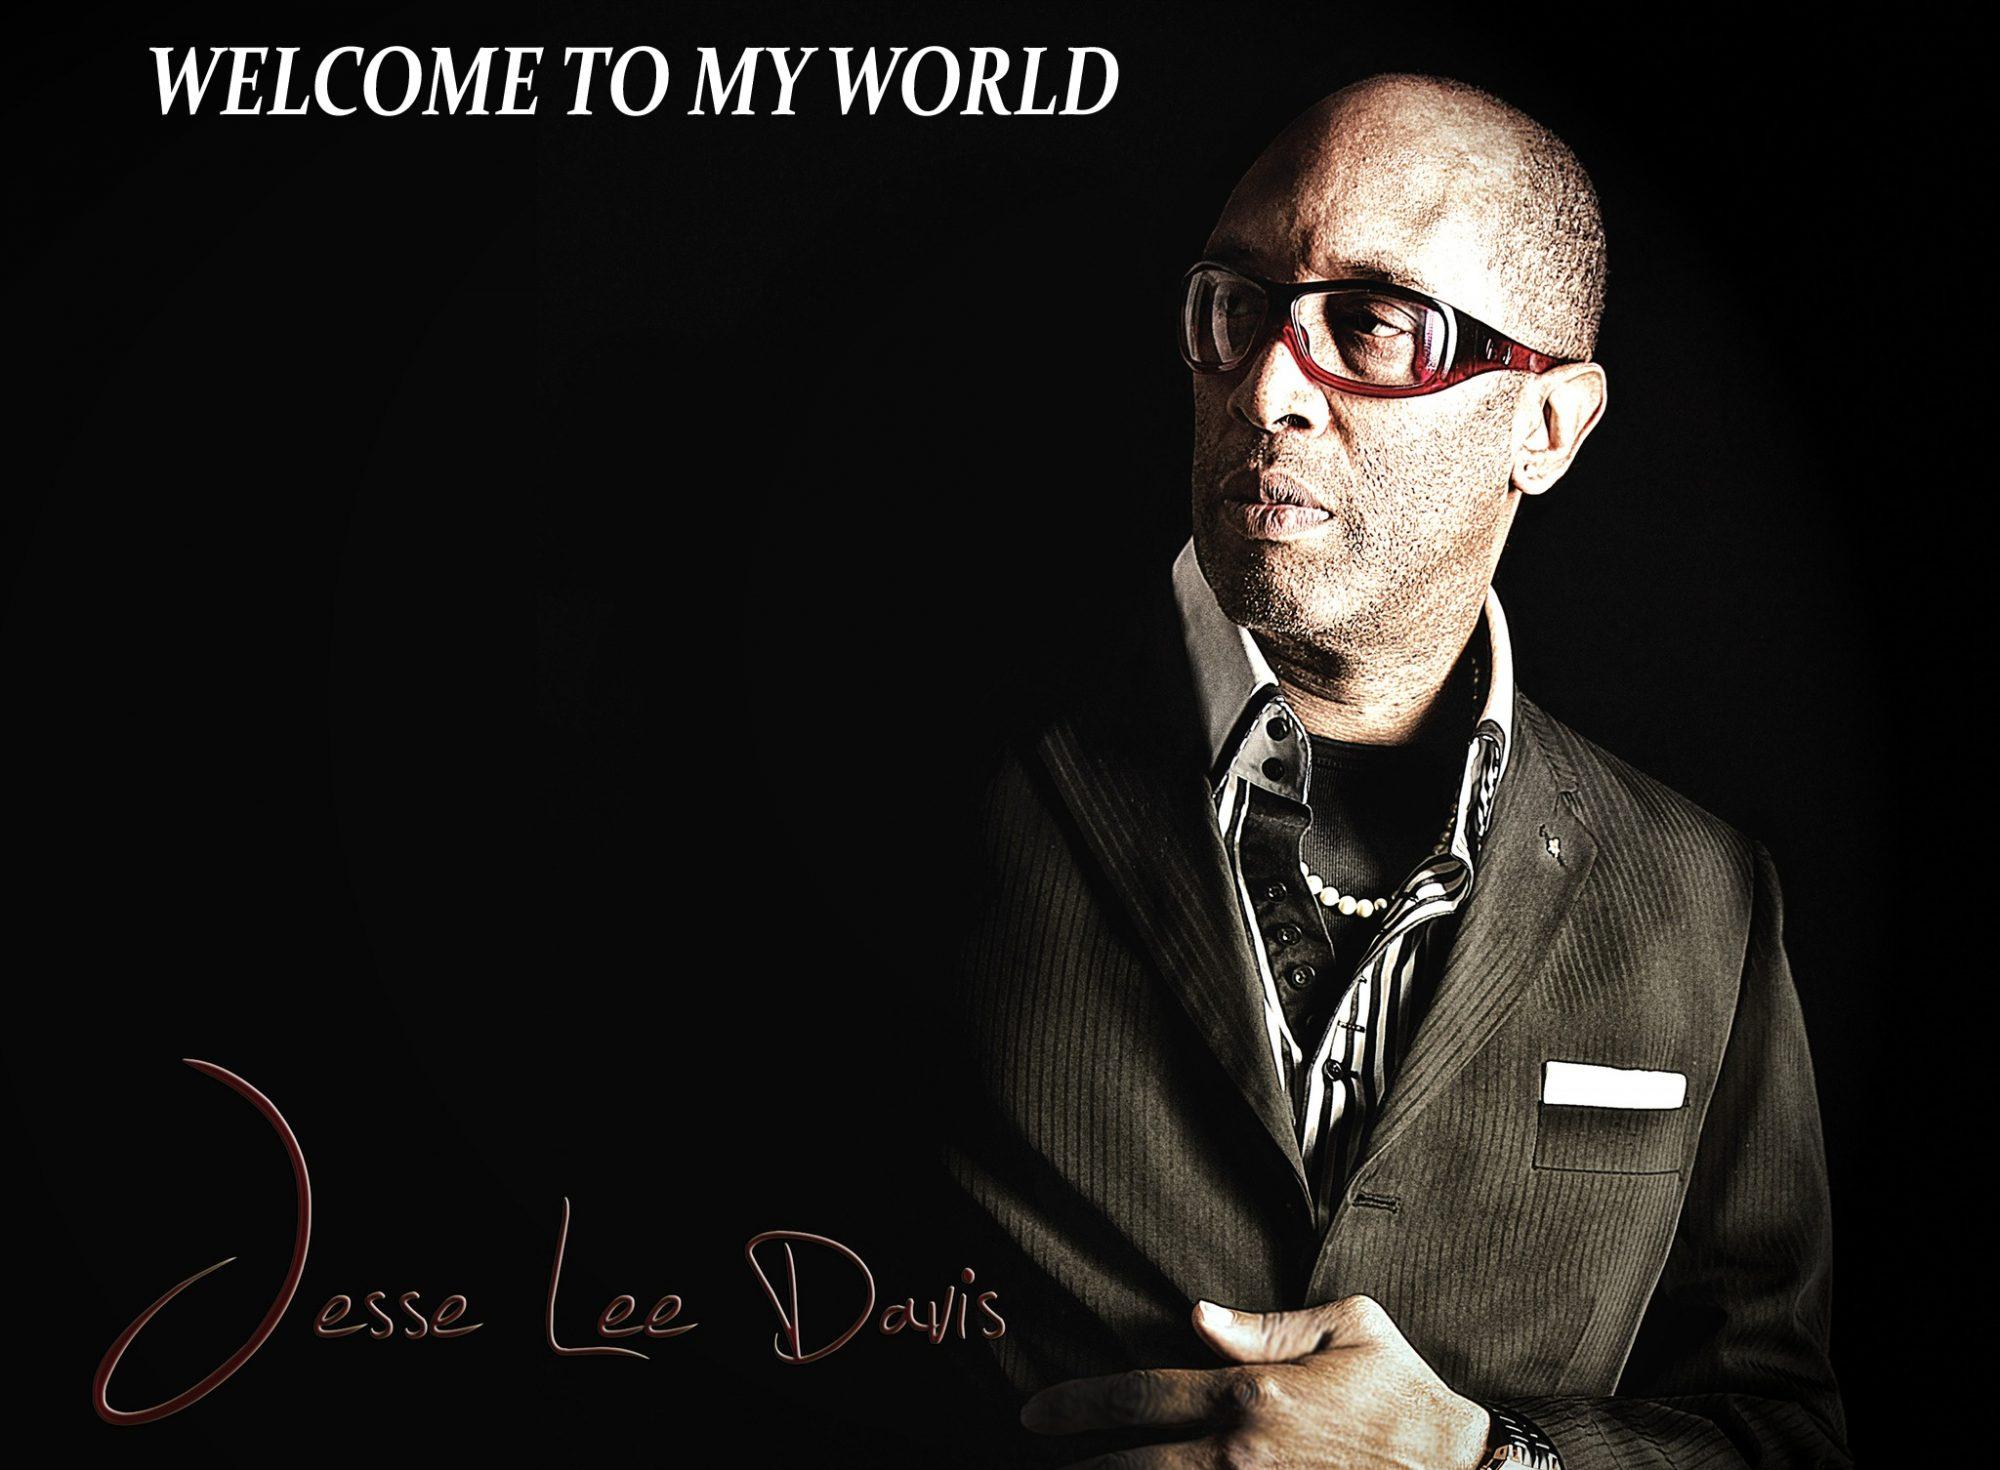 Sir Jesse Lee Davis